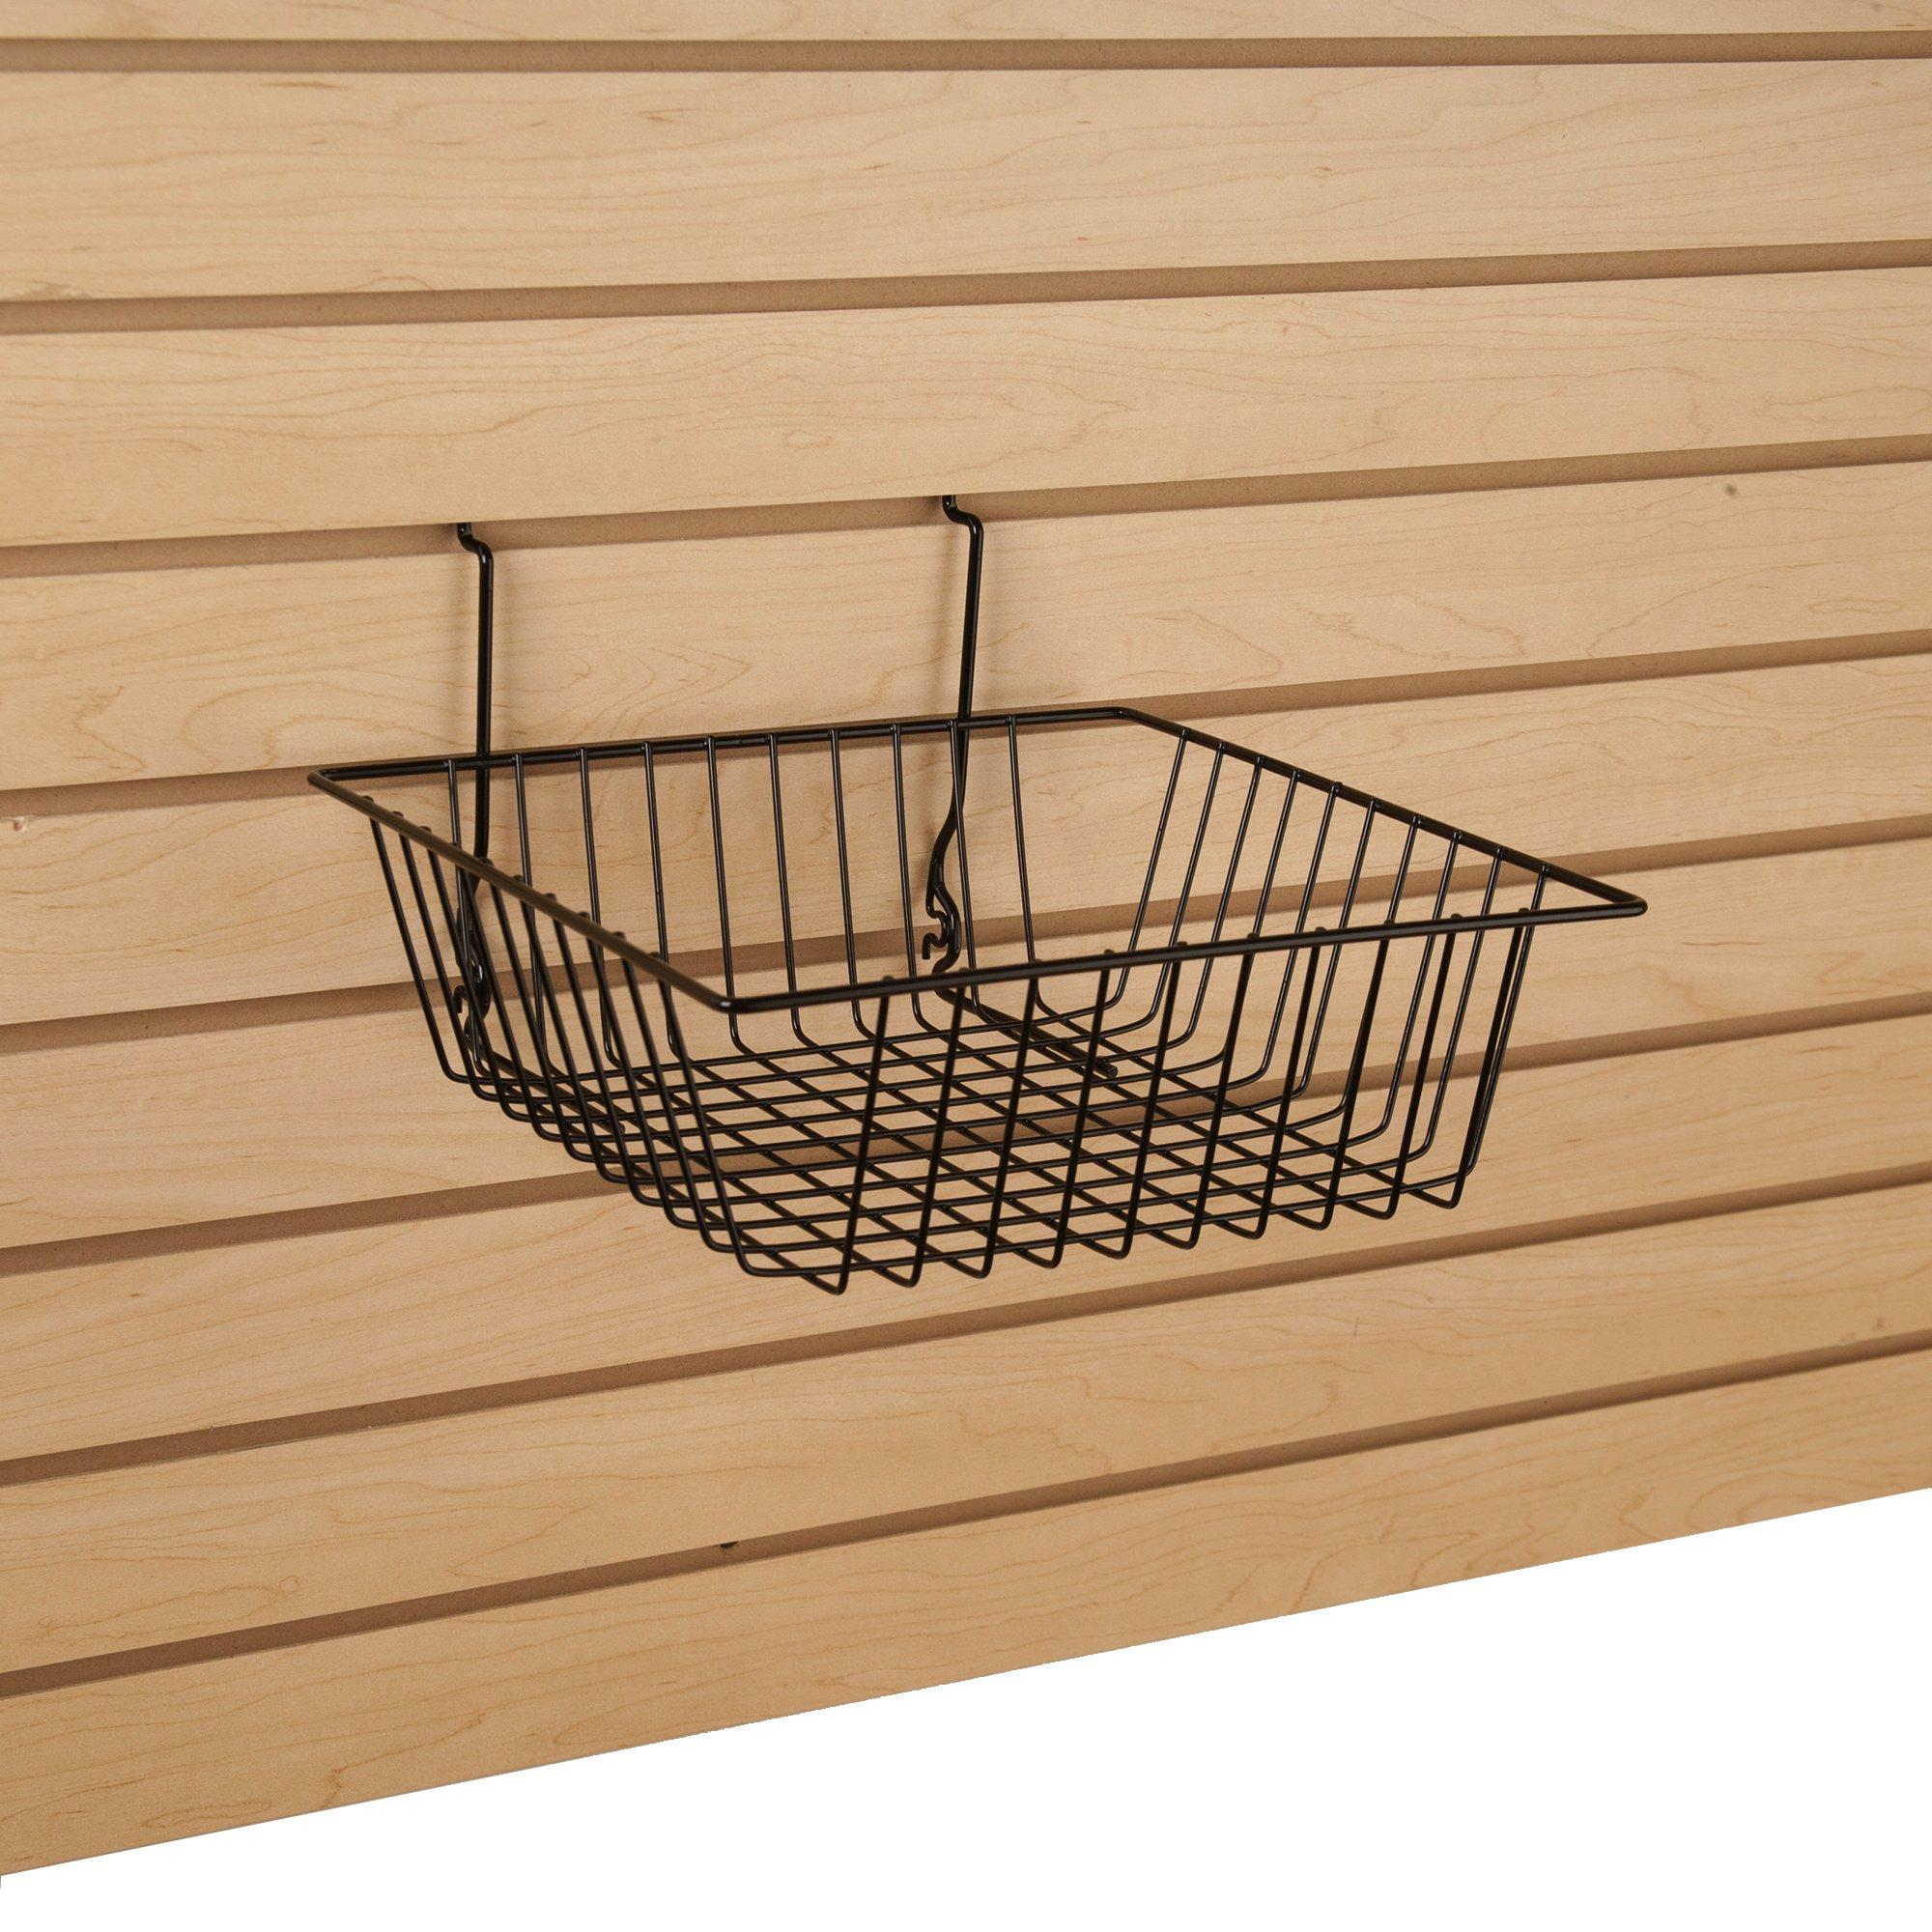 Maple Slatwall Panels Organizer Kit - Includes (2) - 24'' x 48'' Maple Slatwall Panels plus (15) - 6'' Black Slatwall Hooks and (4) 12'' x 12'' x 4'' Black Slatwall Baskets